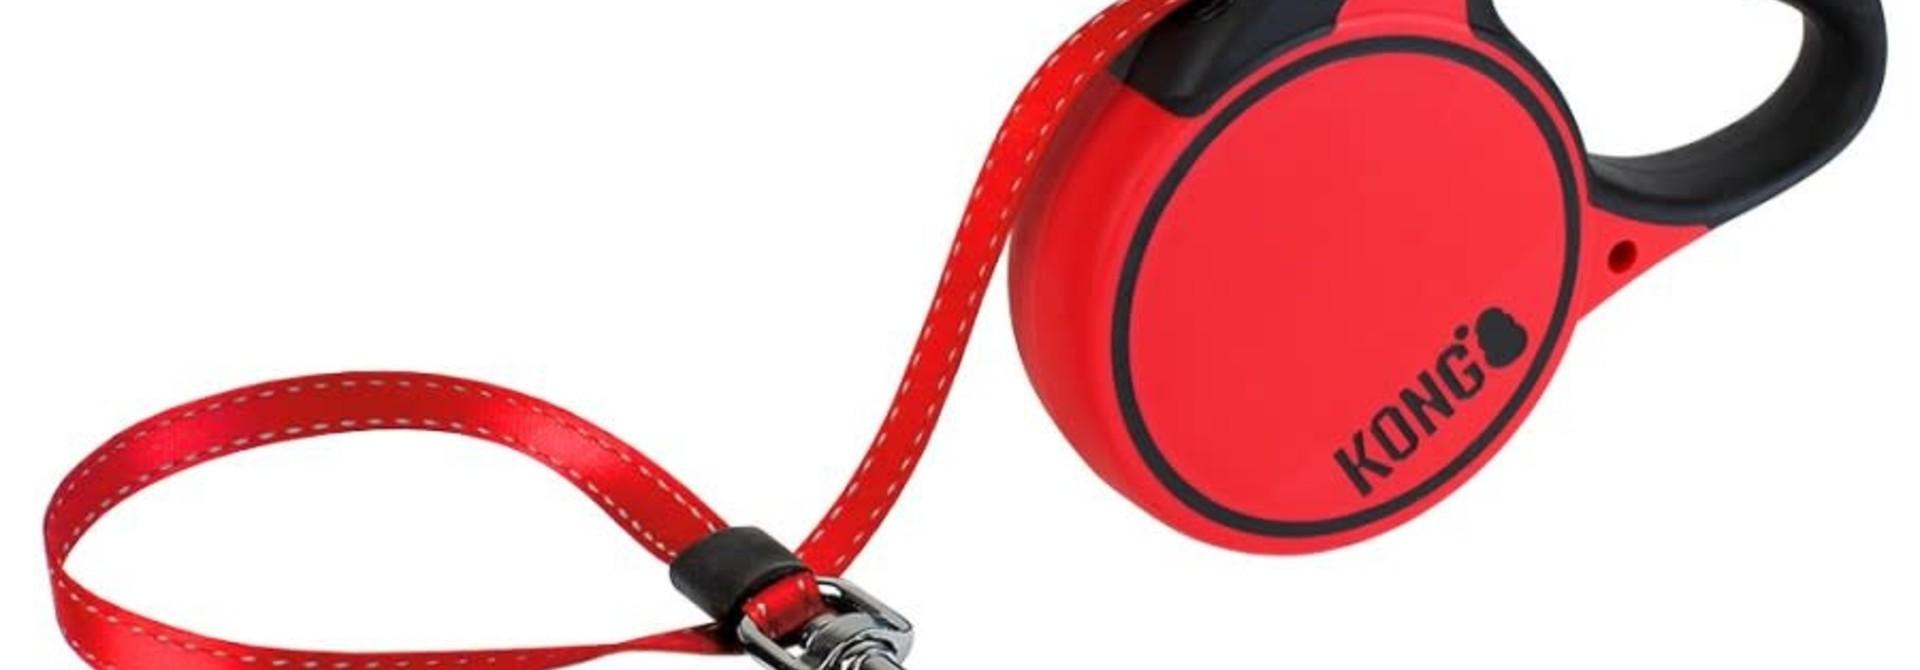 Terrain Retractable Leash- Large - Red